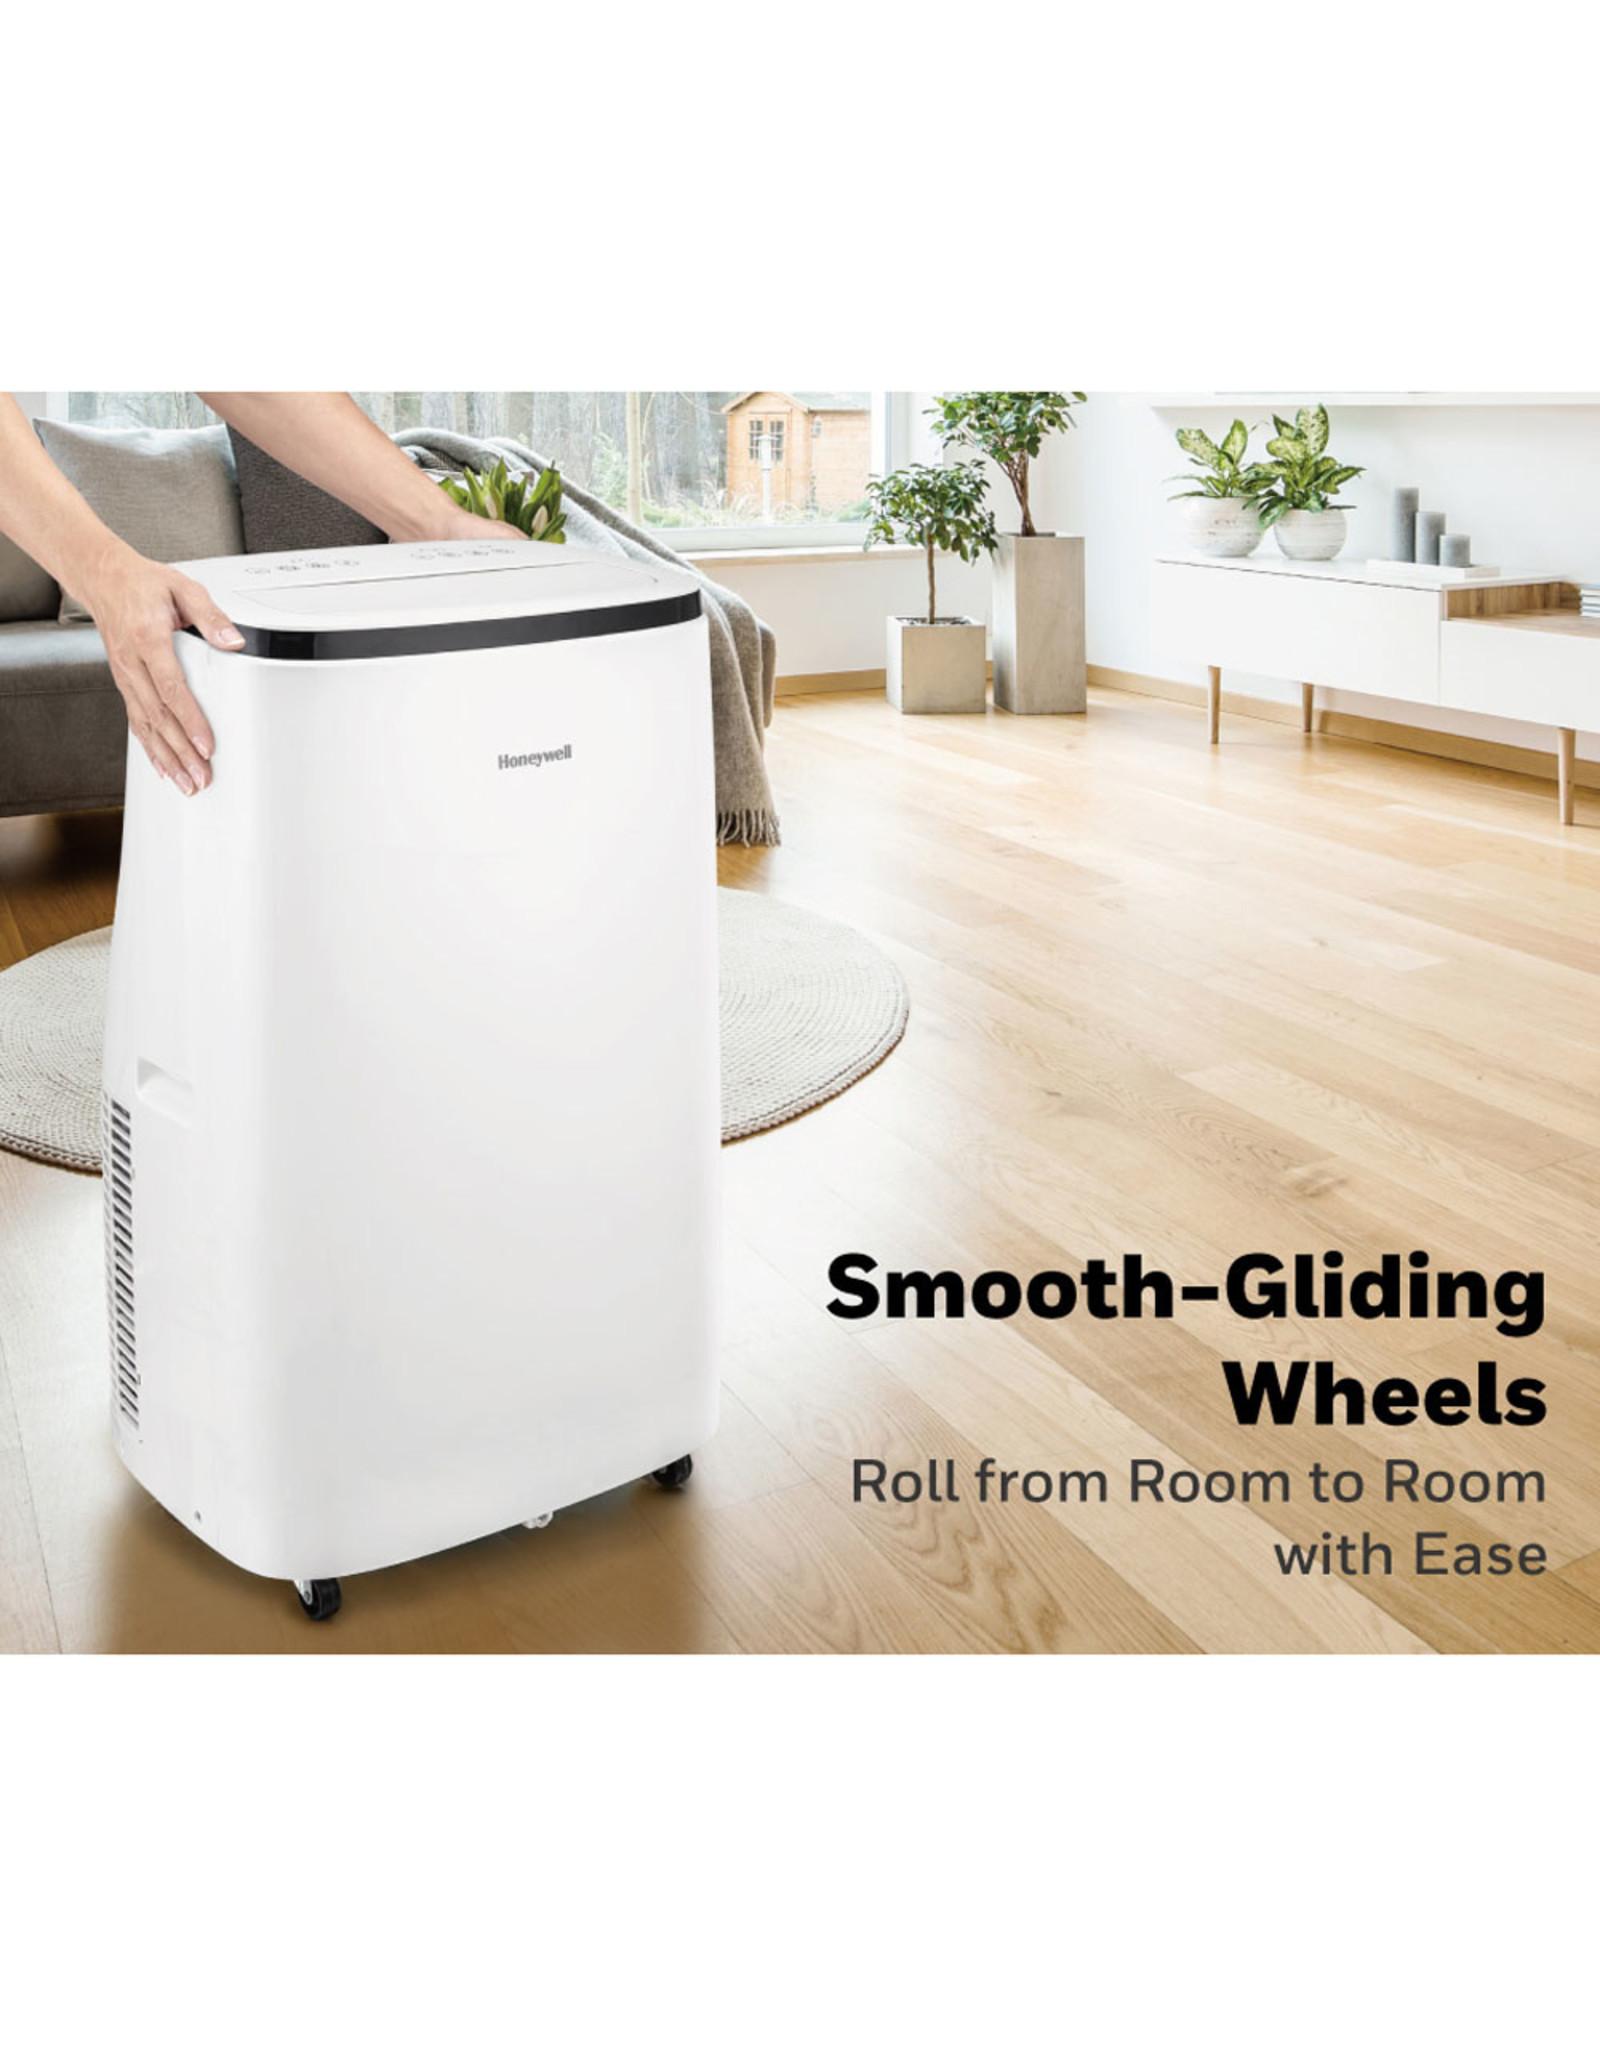 HONEYWELL HJ0CESWK7 Honeywell 10,000 BTU Contempo Series Portable Air Conditioner, Dehumidifier & Fan - White,